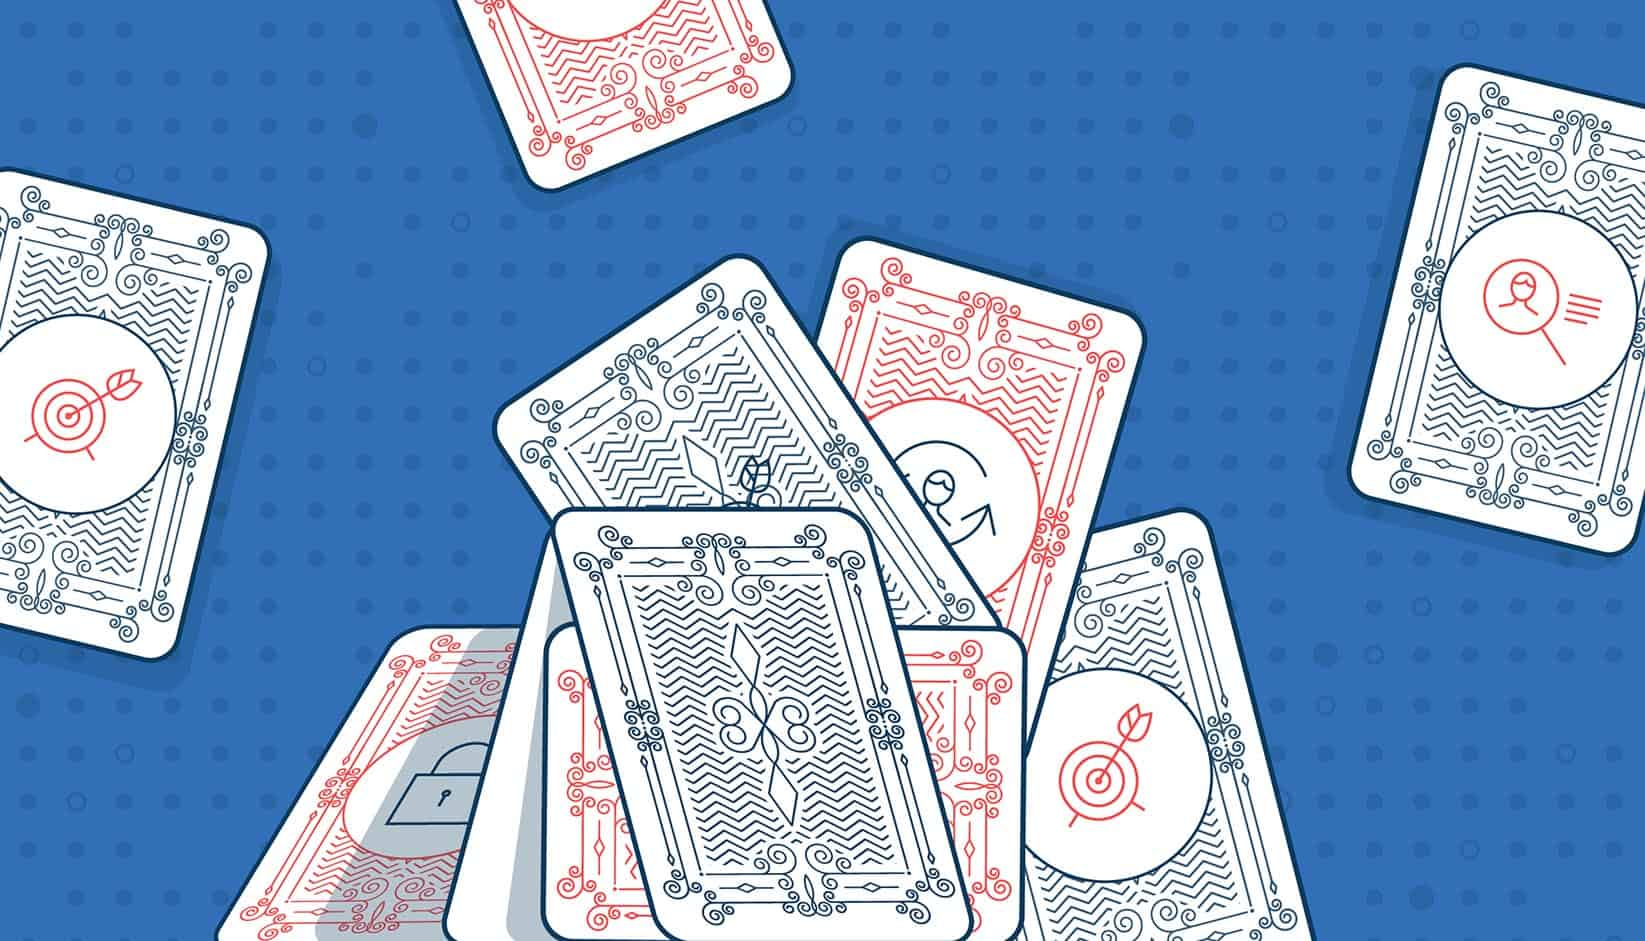 Identity program house of cards